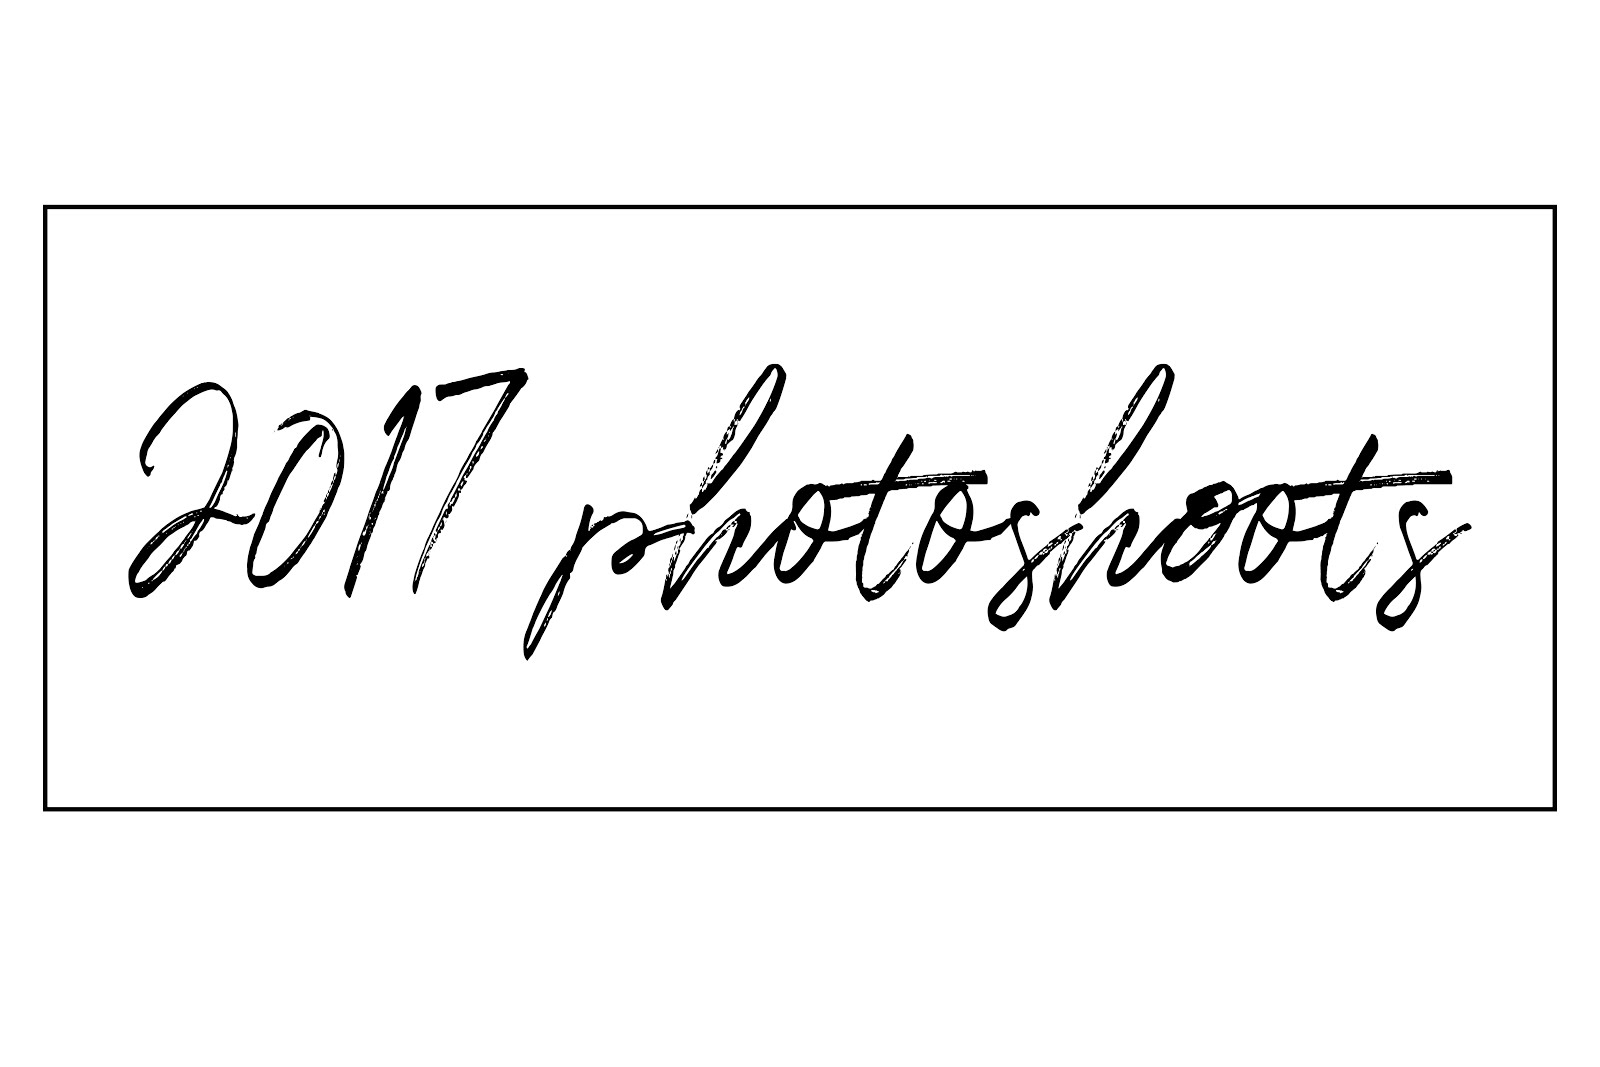 2017 Photoshoots